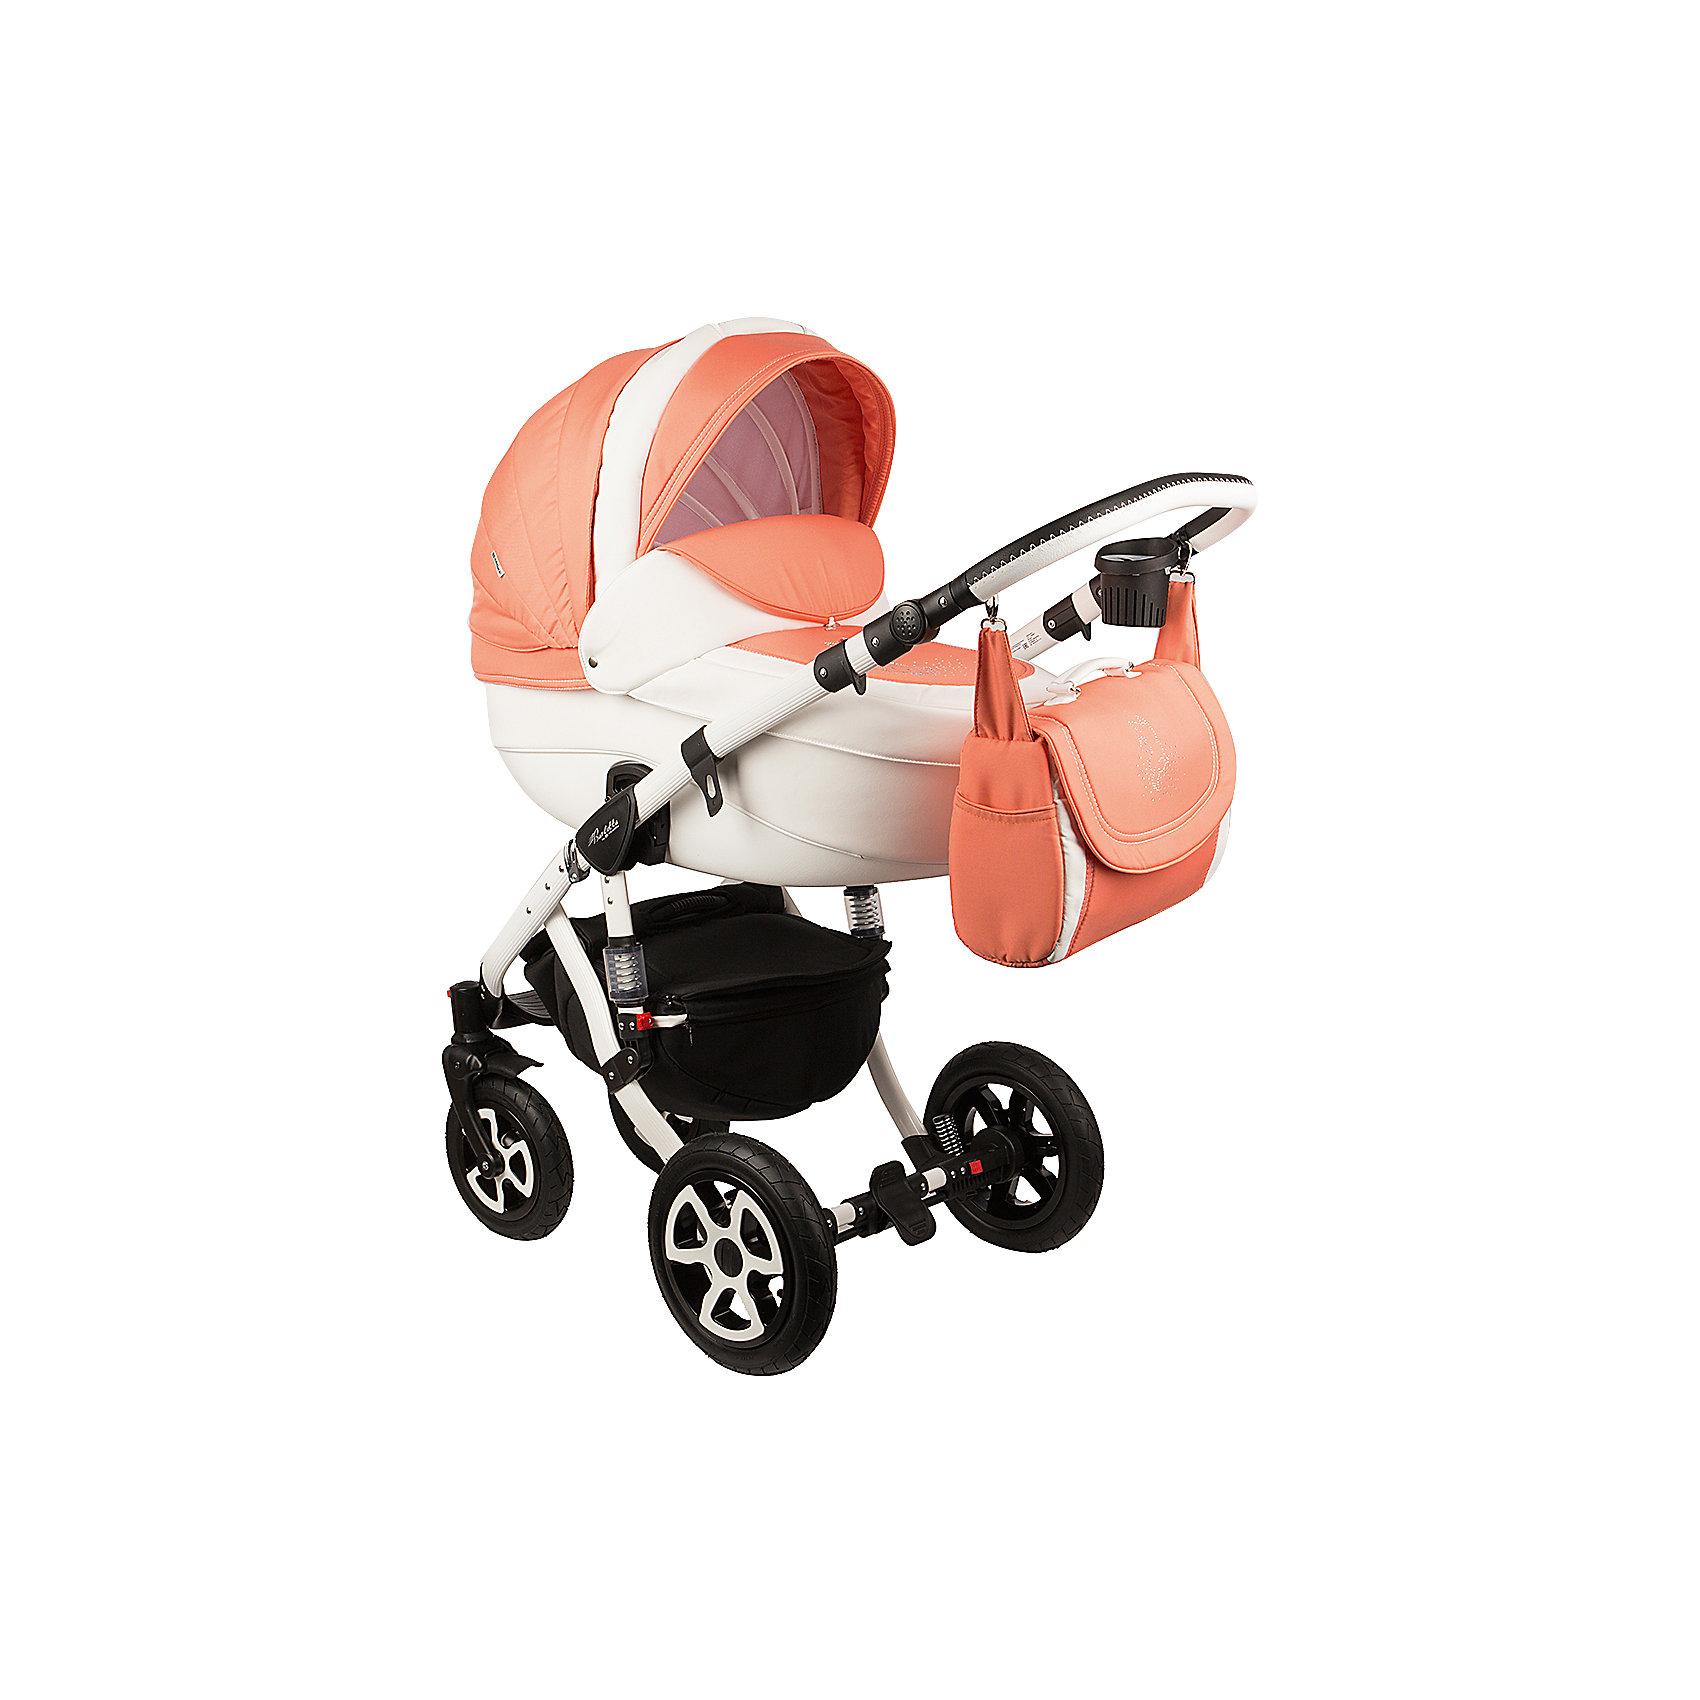 Adamex Коляска 2 в 1 Barletta, Adamex, Лисёнок белый/оранжевый adamex коляска 2 в 1 barletta adamex лисёнок белый оранжевый